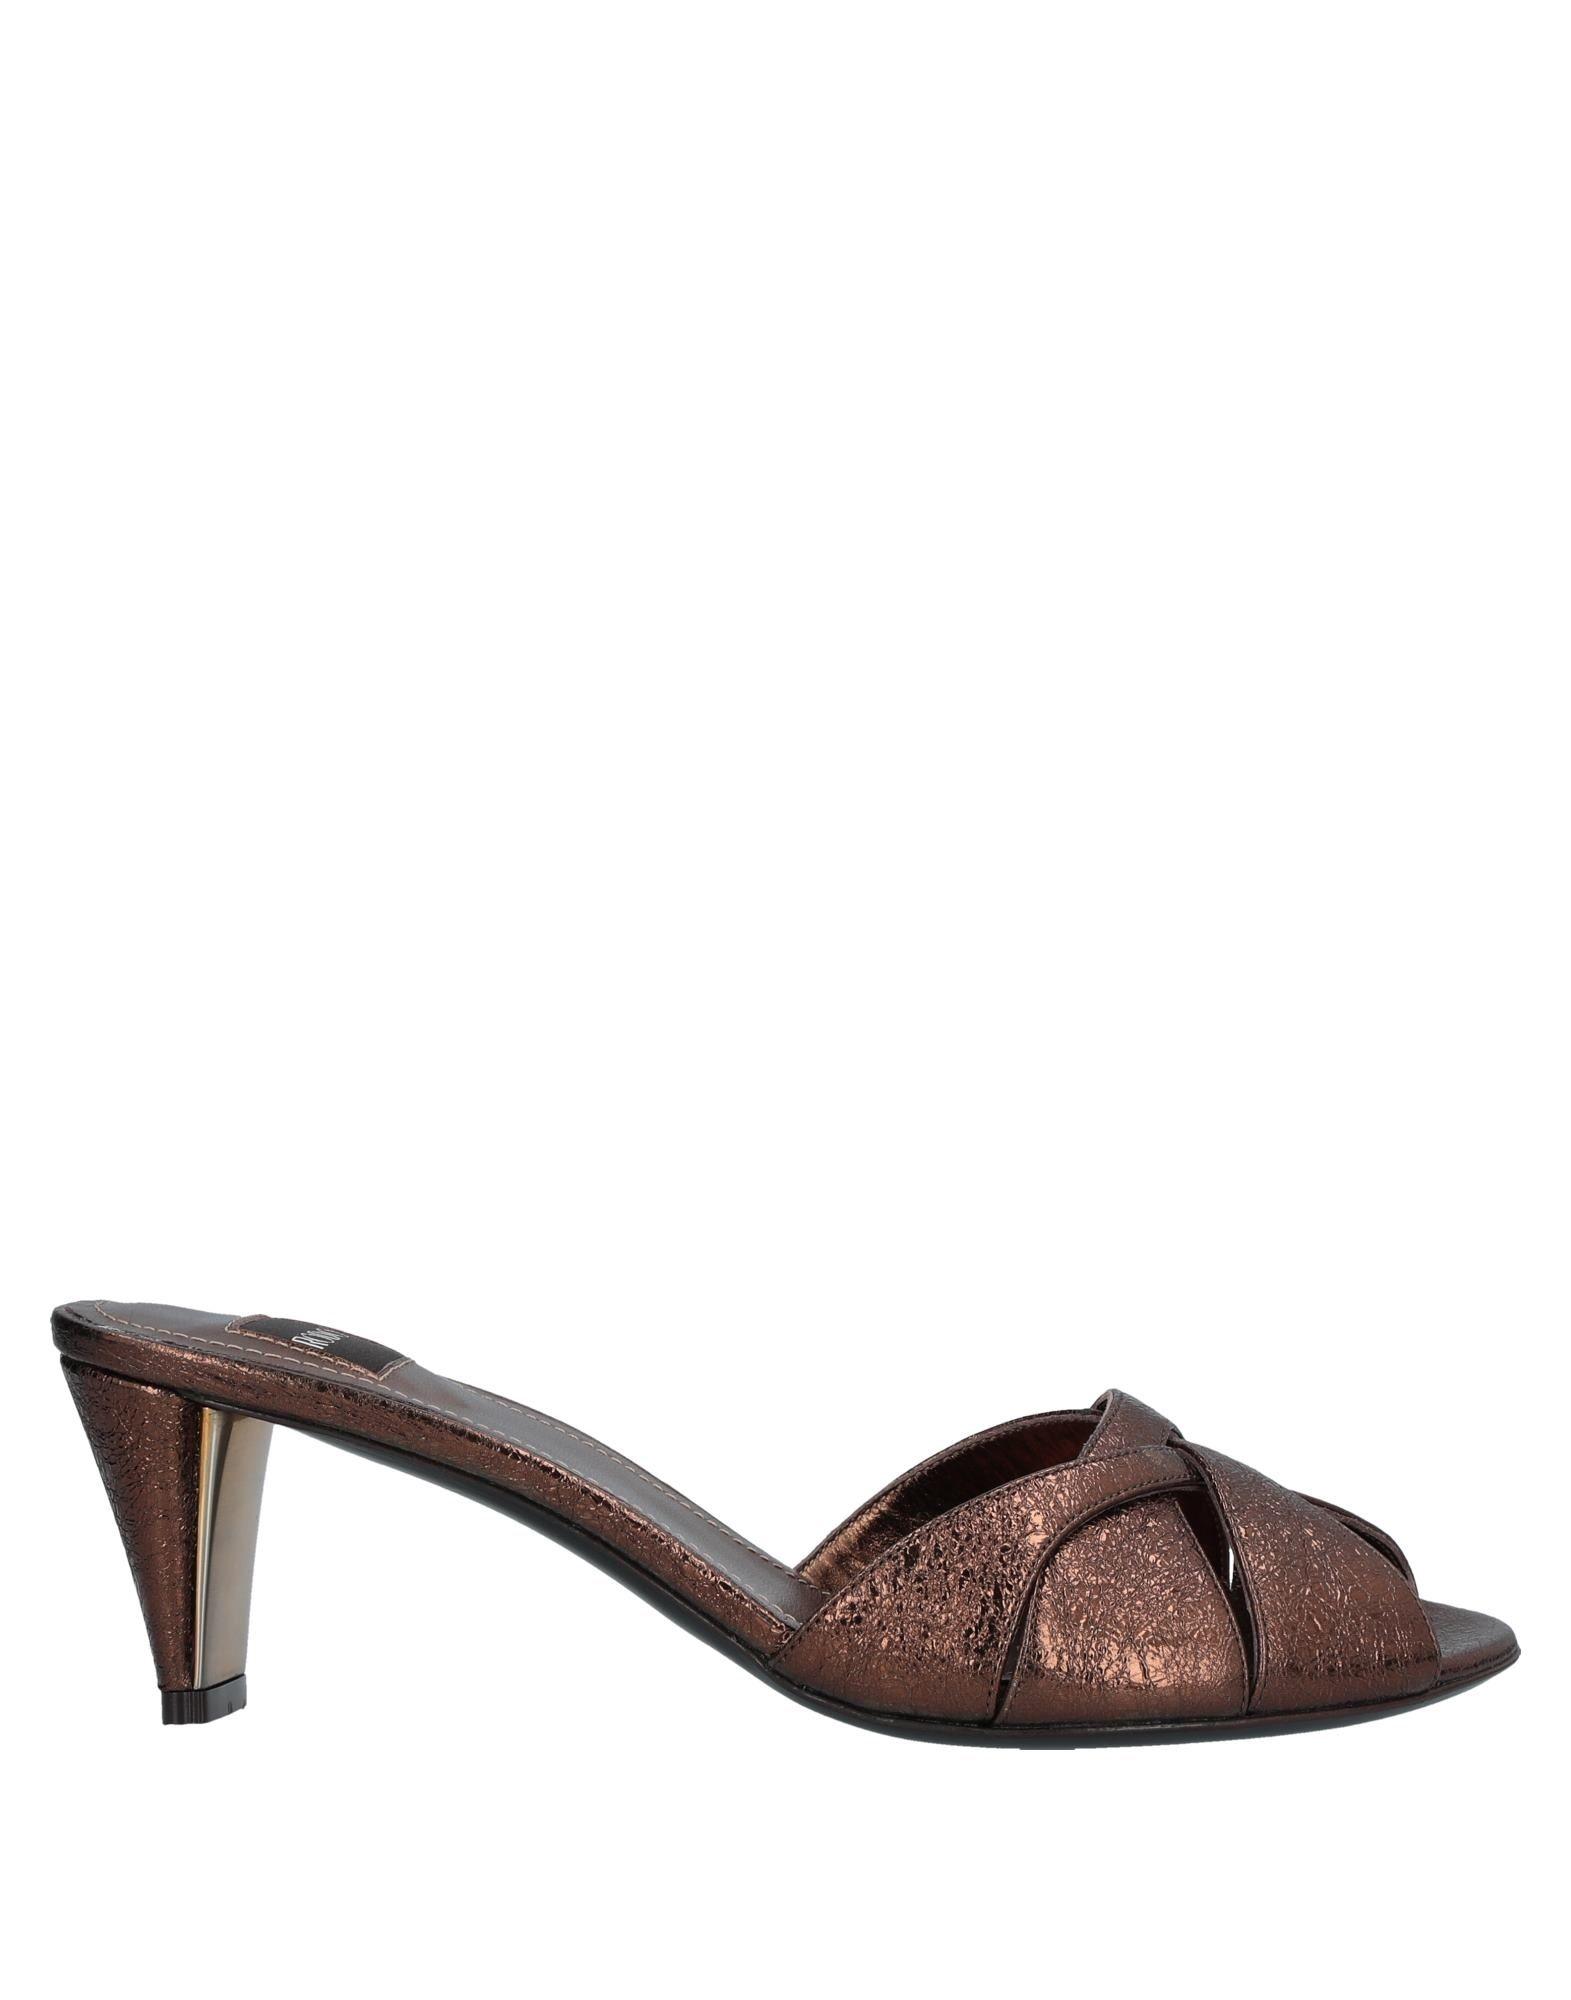 Moda Sandali Sandali Moda Rodo Donna - 11538485TX f0551f